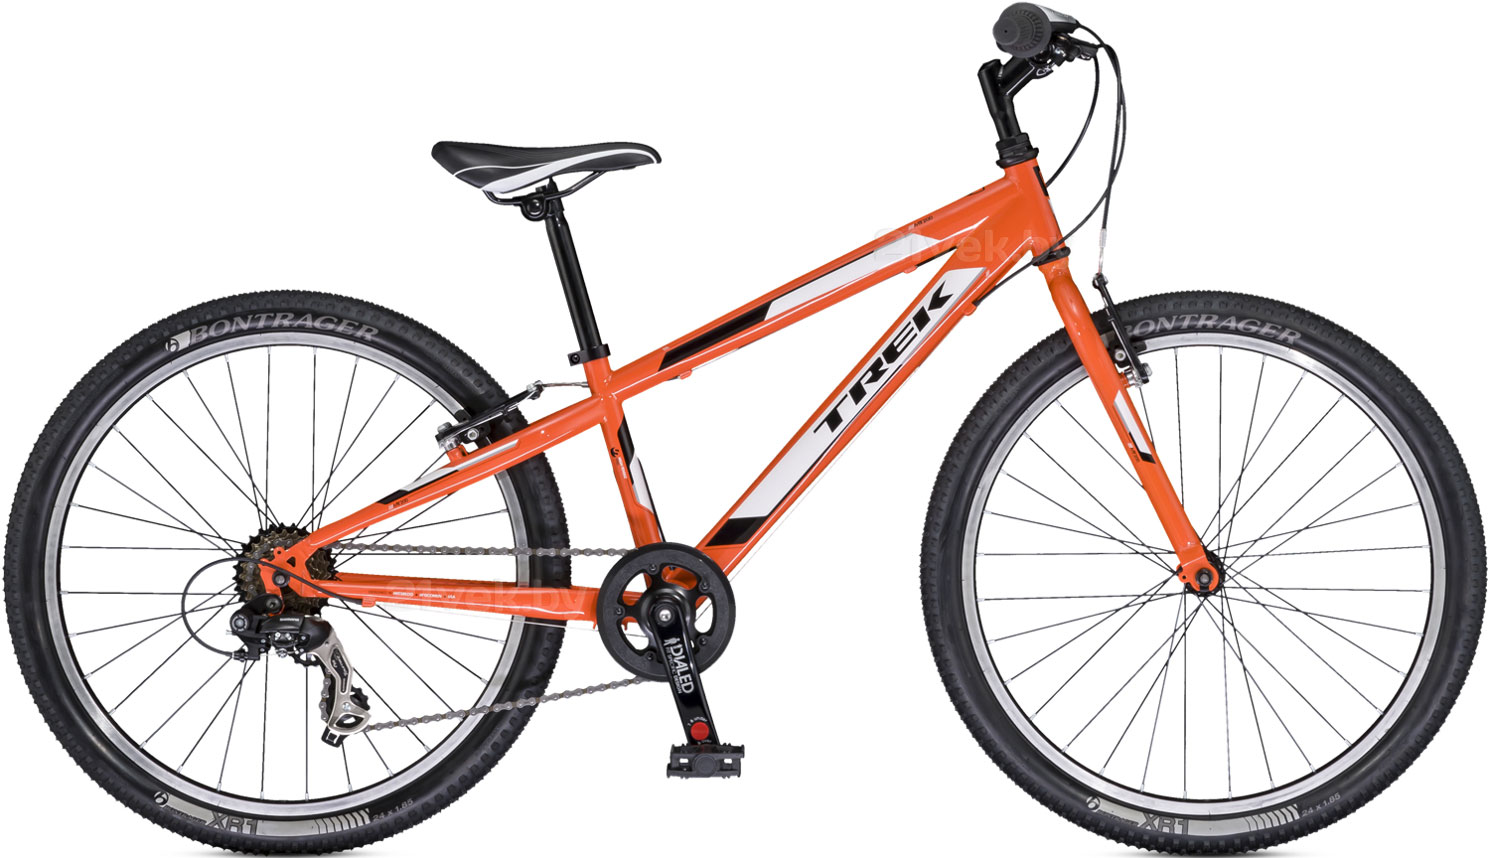 MT 200 Boy's (24, Orange, 2014) 21vek.by 2958000.000